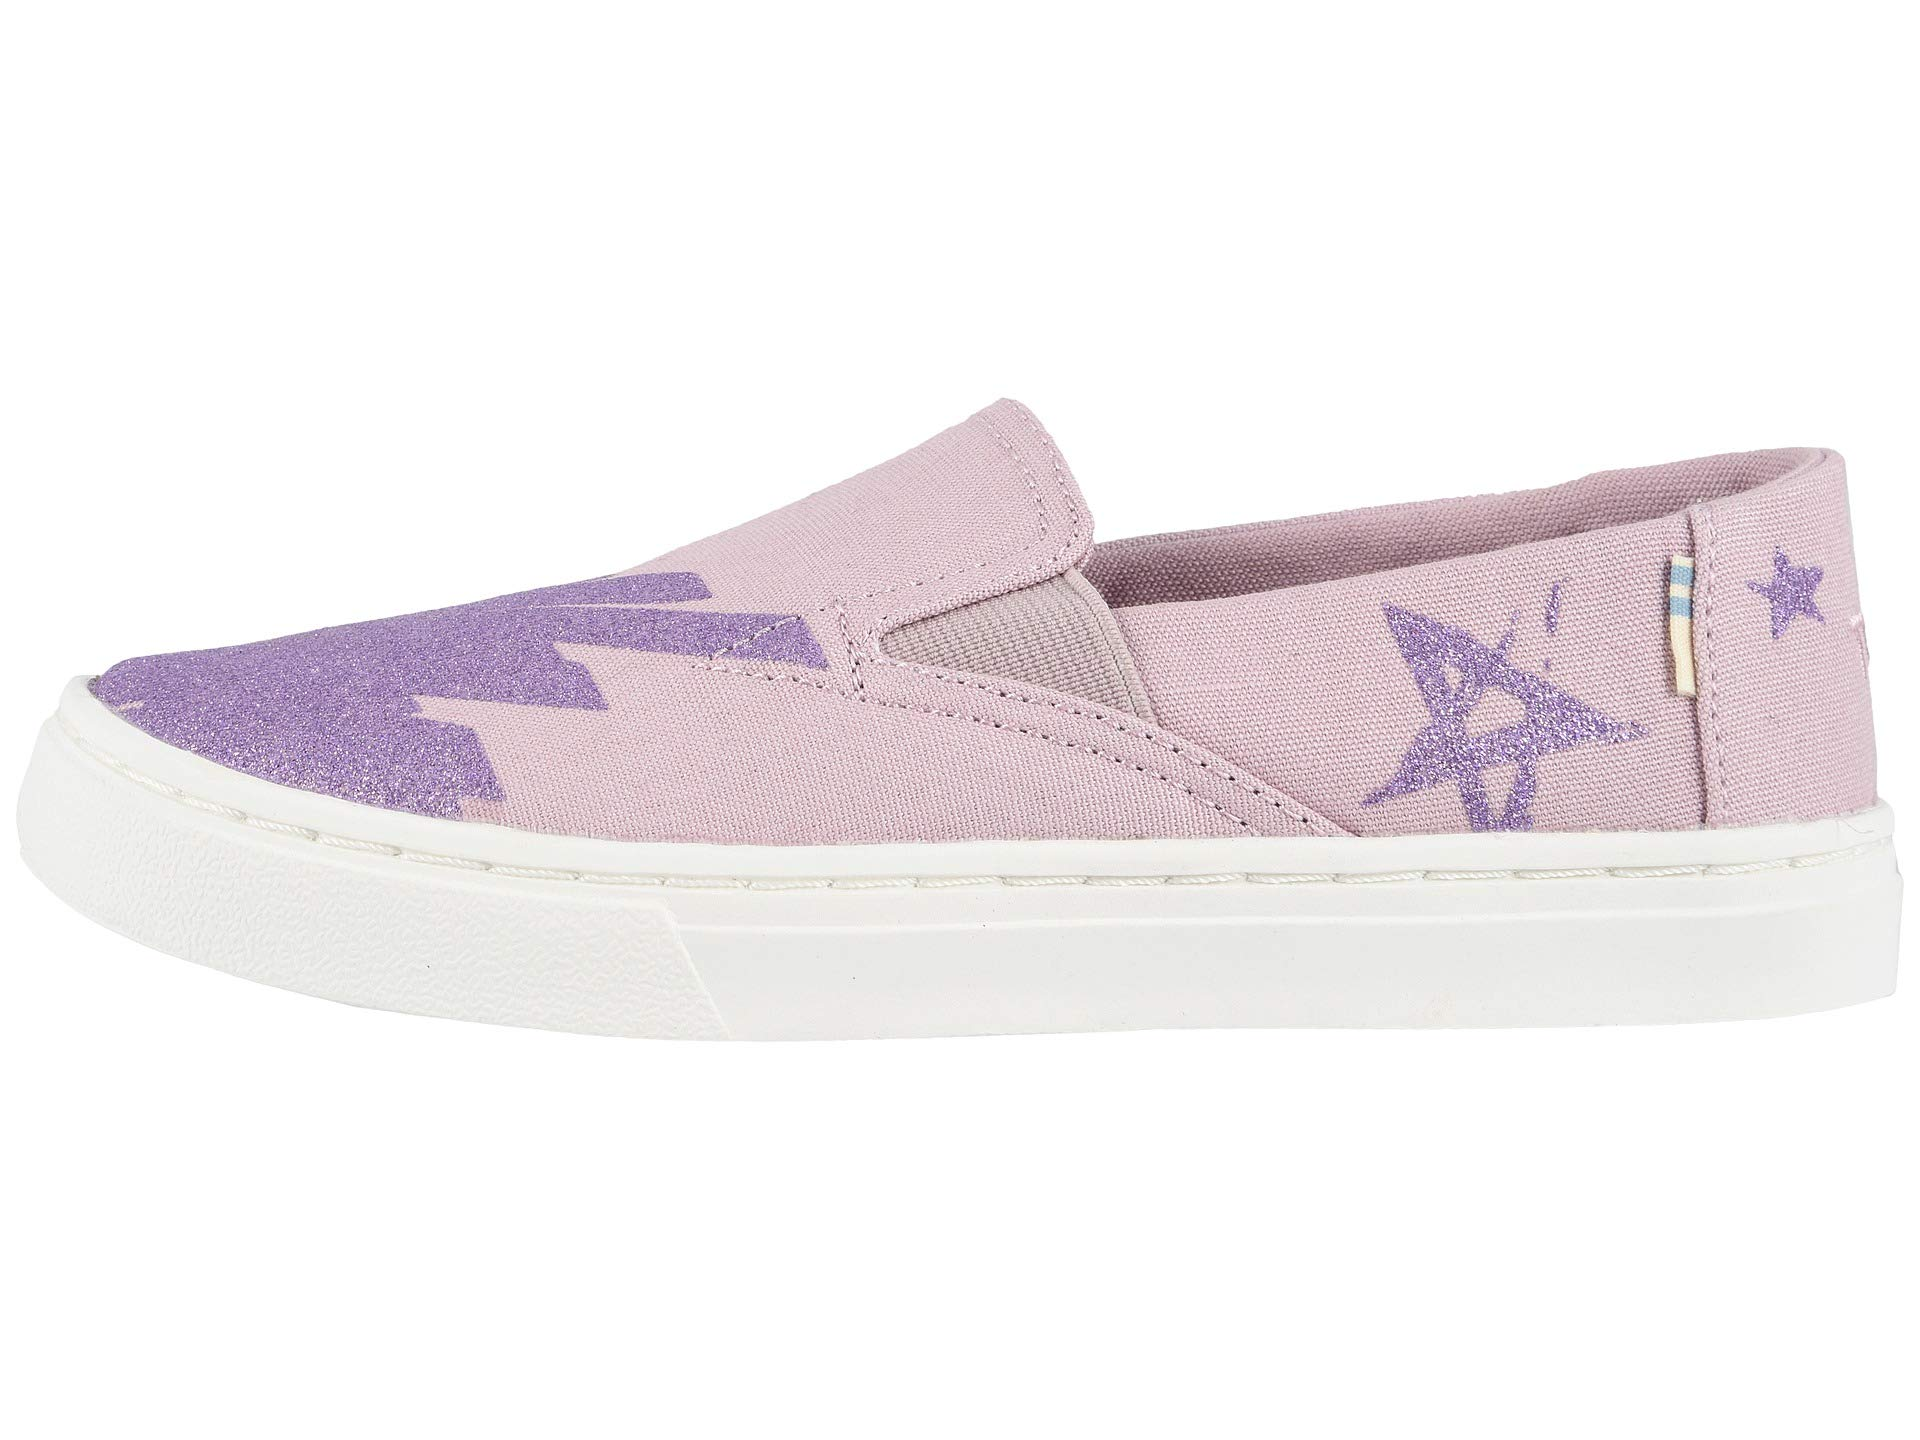 TOMS Youth Luca Slip-On Shoes, Size: 3.5 M US Big Kid, Color: Brnsh Lilac Glt Star by TOMS Kids (Image #6)